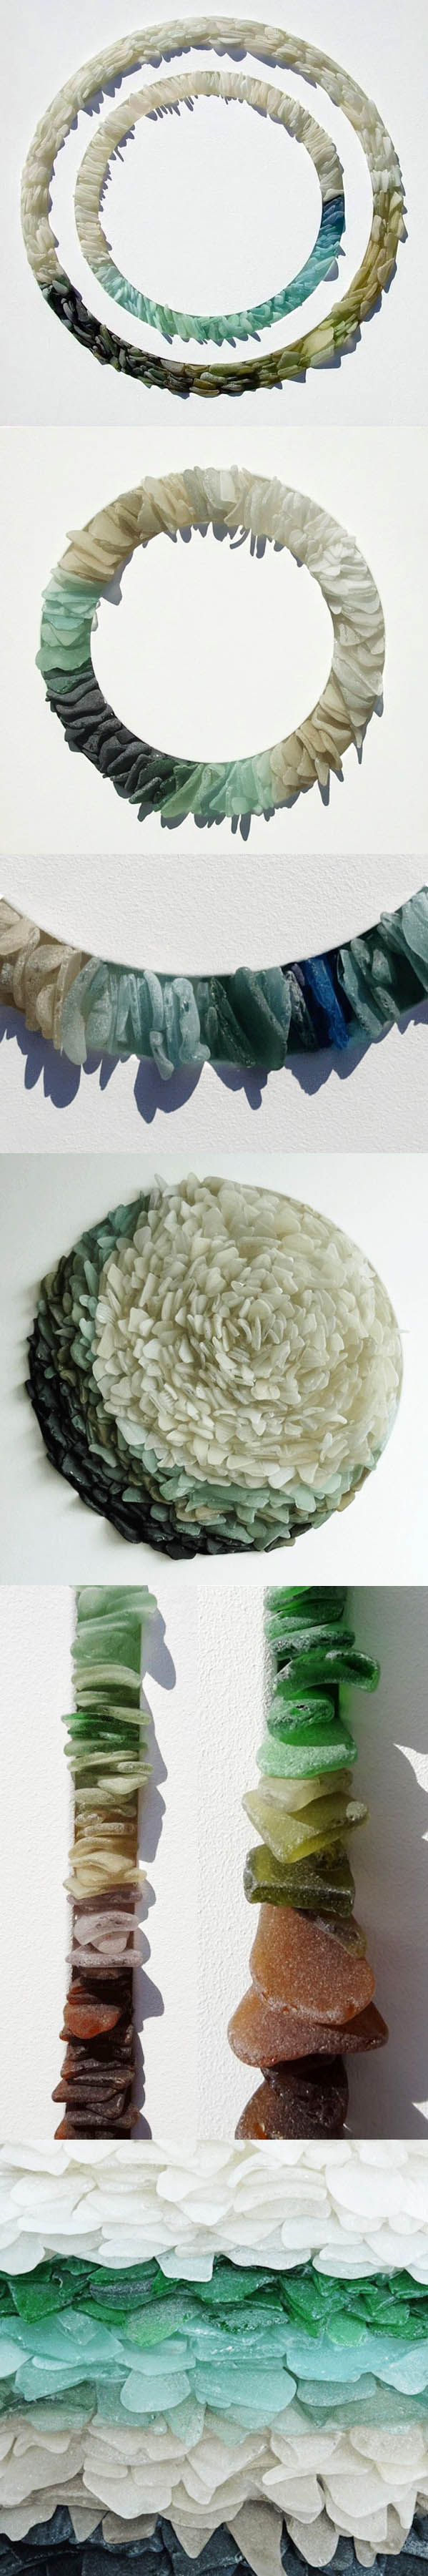 Terra Sophia - Sea Recup' Art - Tableaux de Jonathan Fuller